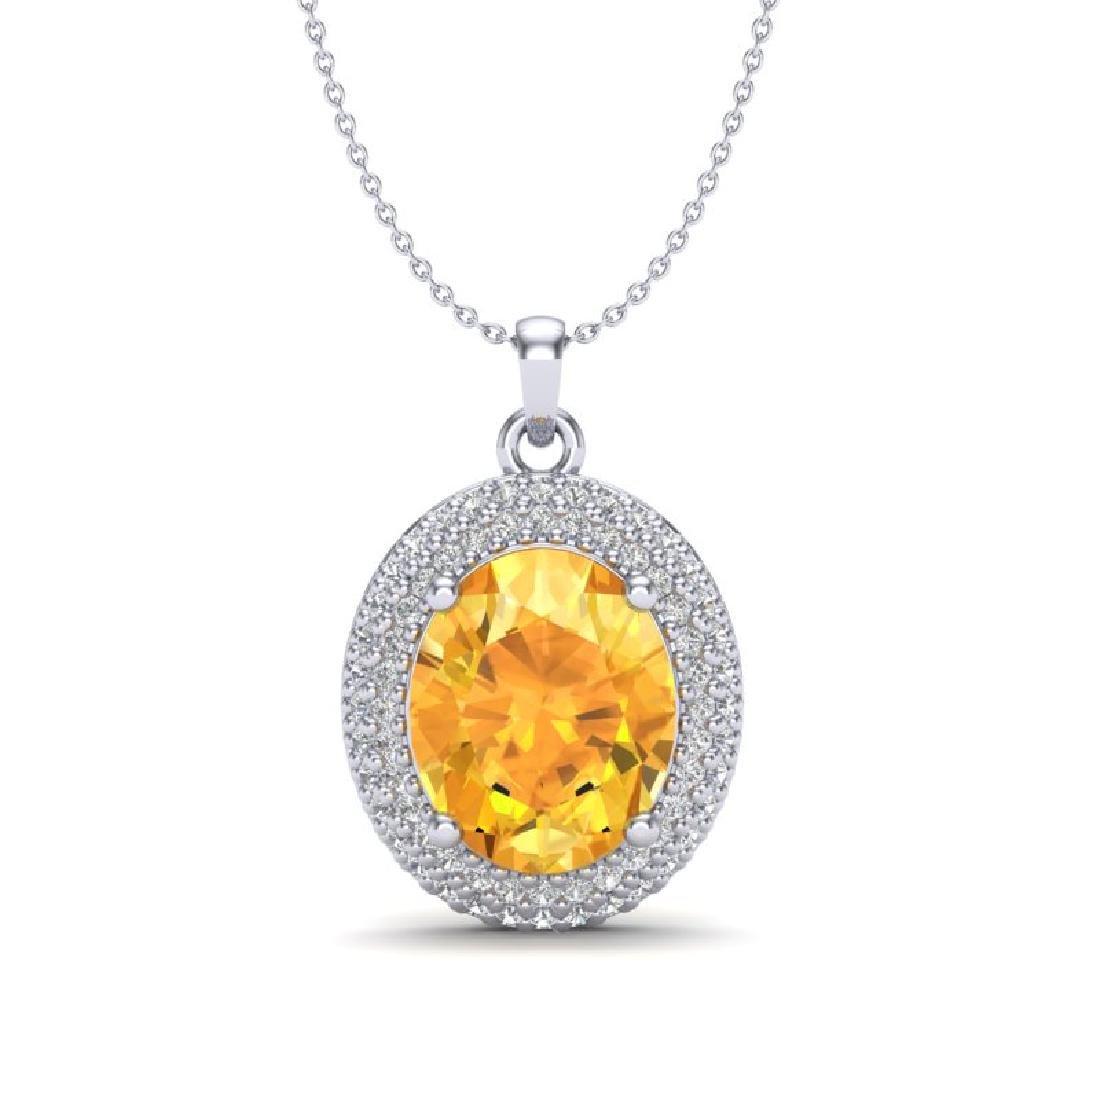 4 CTW Citrine & Micro Pave VS/SI Diamond Necklace 18K